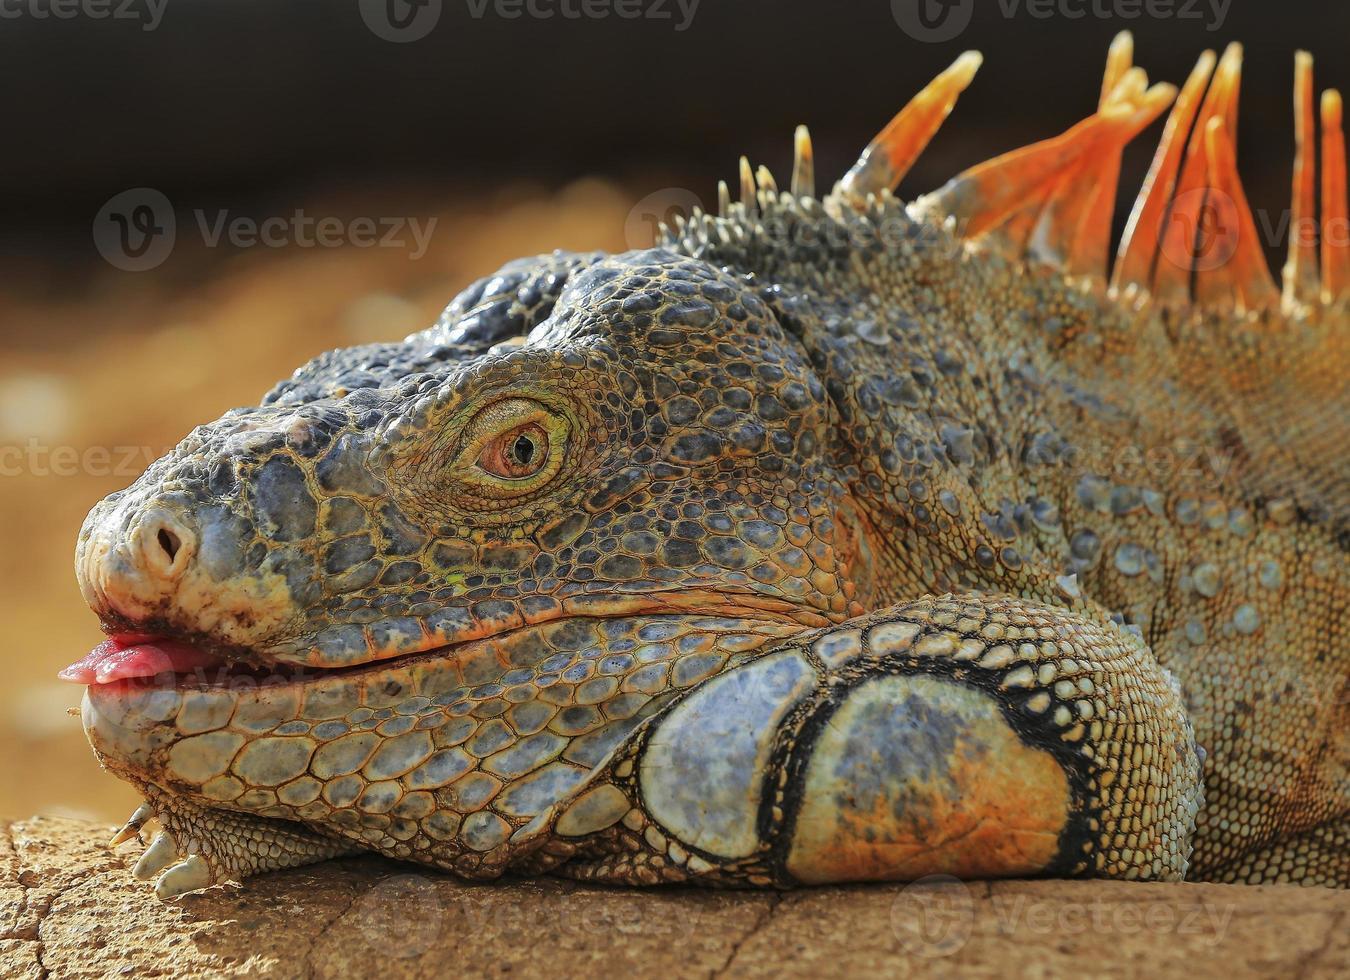 l'iguana verde si muove nell'habitat naturale foto